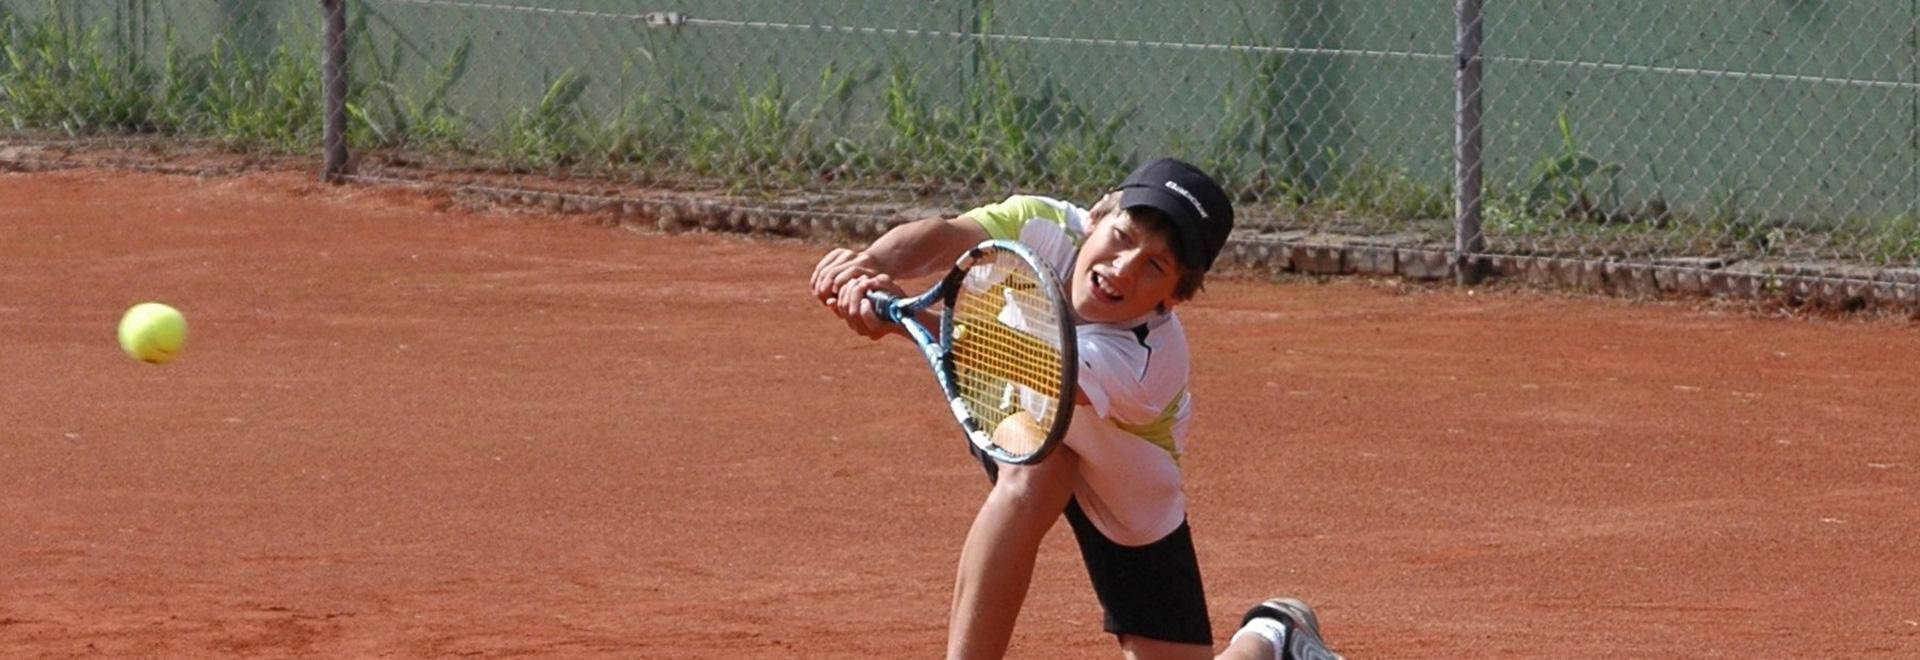 demo_tennis_2